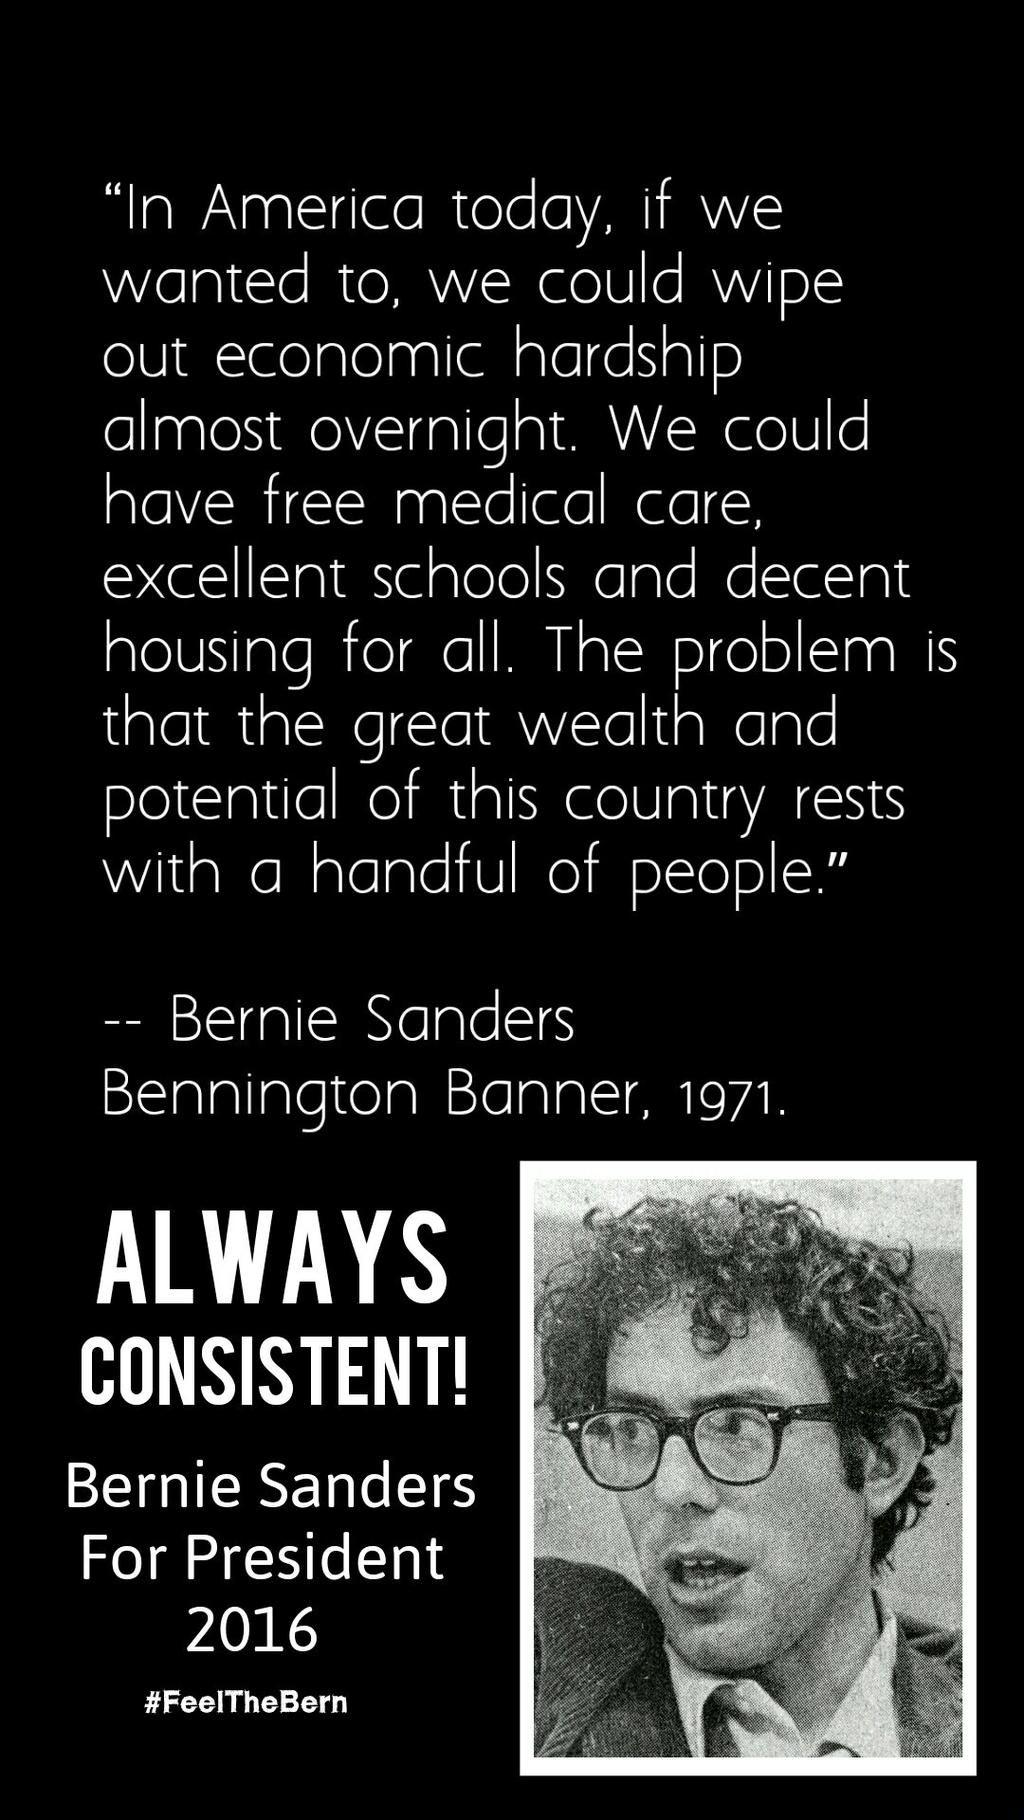 #AlwaysConsistent #Sanders2016 #FeelTheBern @Women4Bernie @Bernie2016tv @BandsForBernie @berniesanders